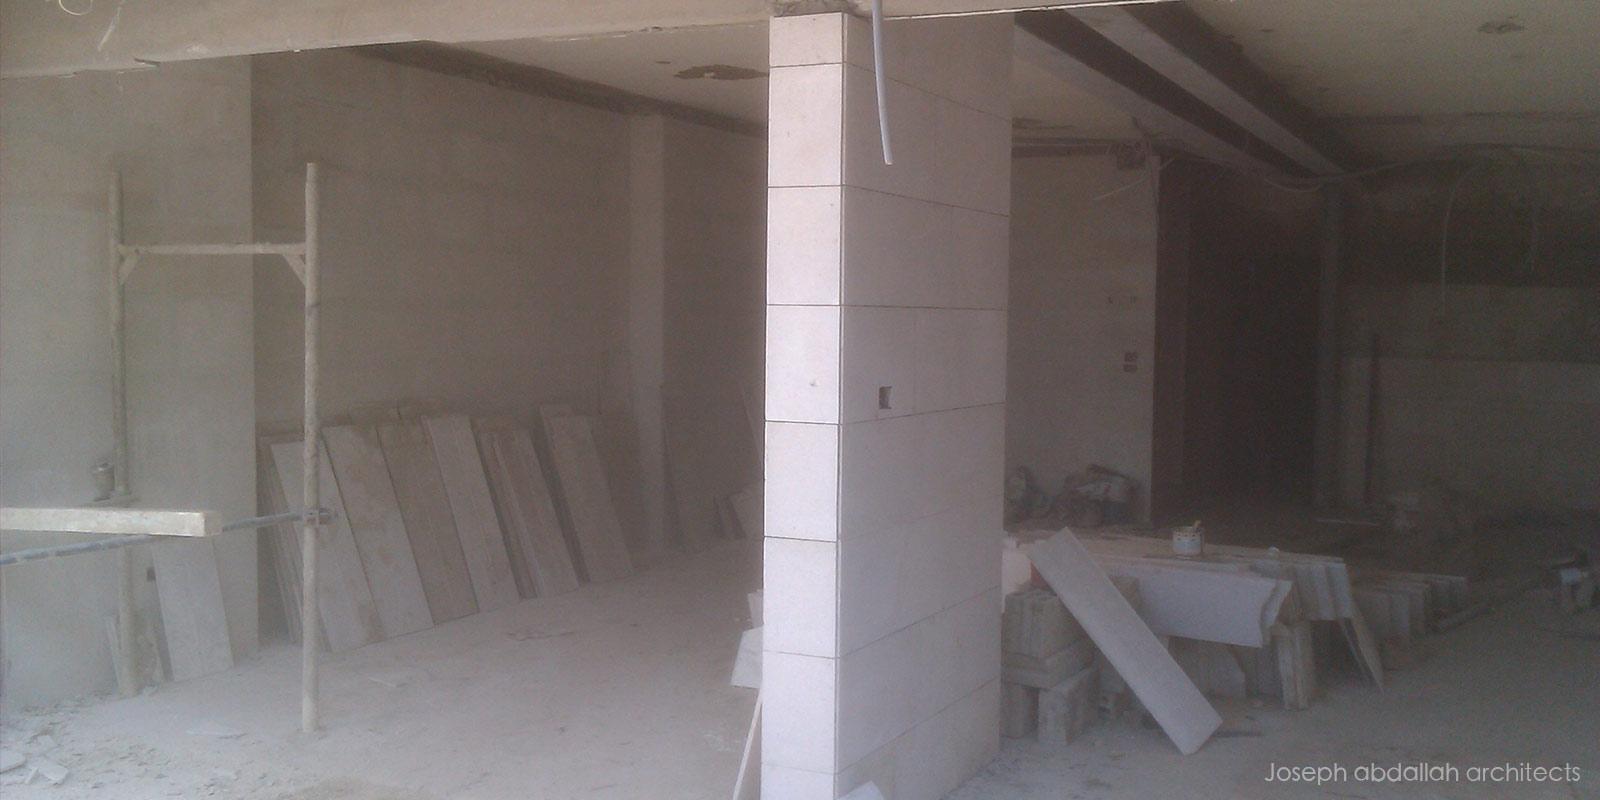 halat-sur-mer-hamod-chalet-interior-architecture-joseph-abdallah-architects-1